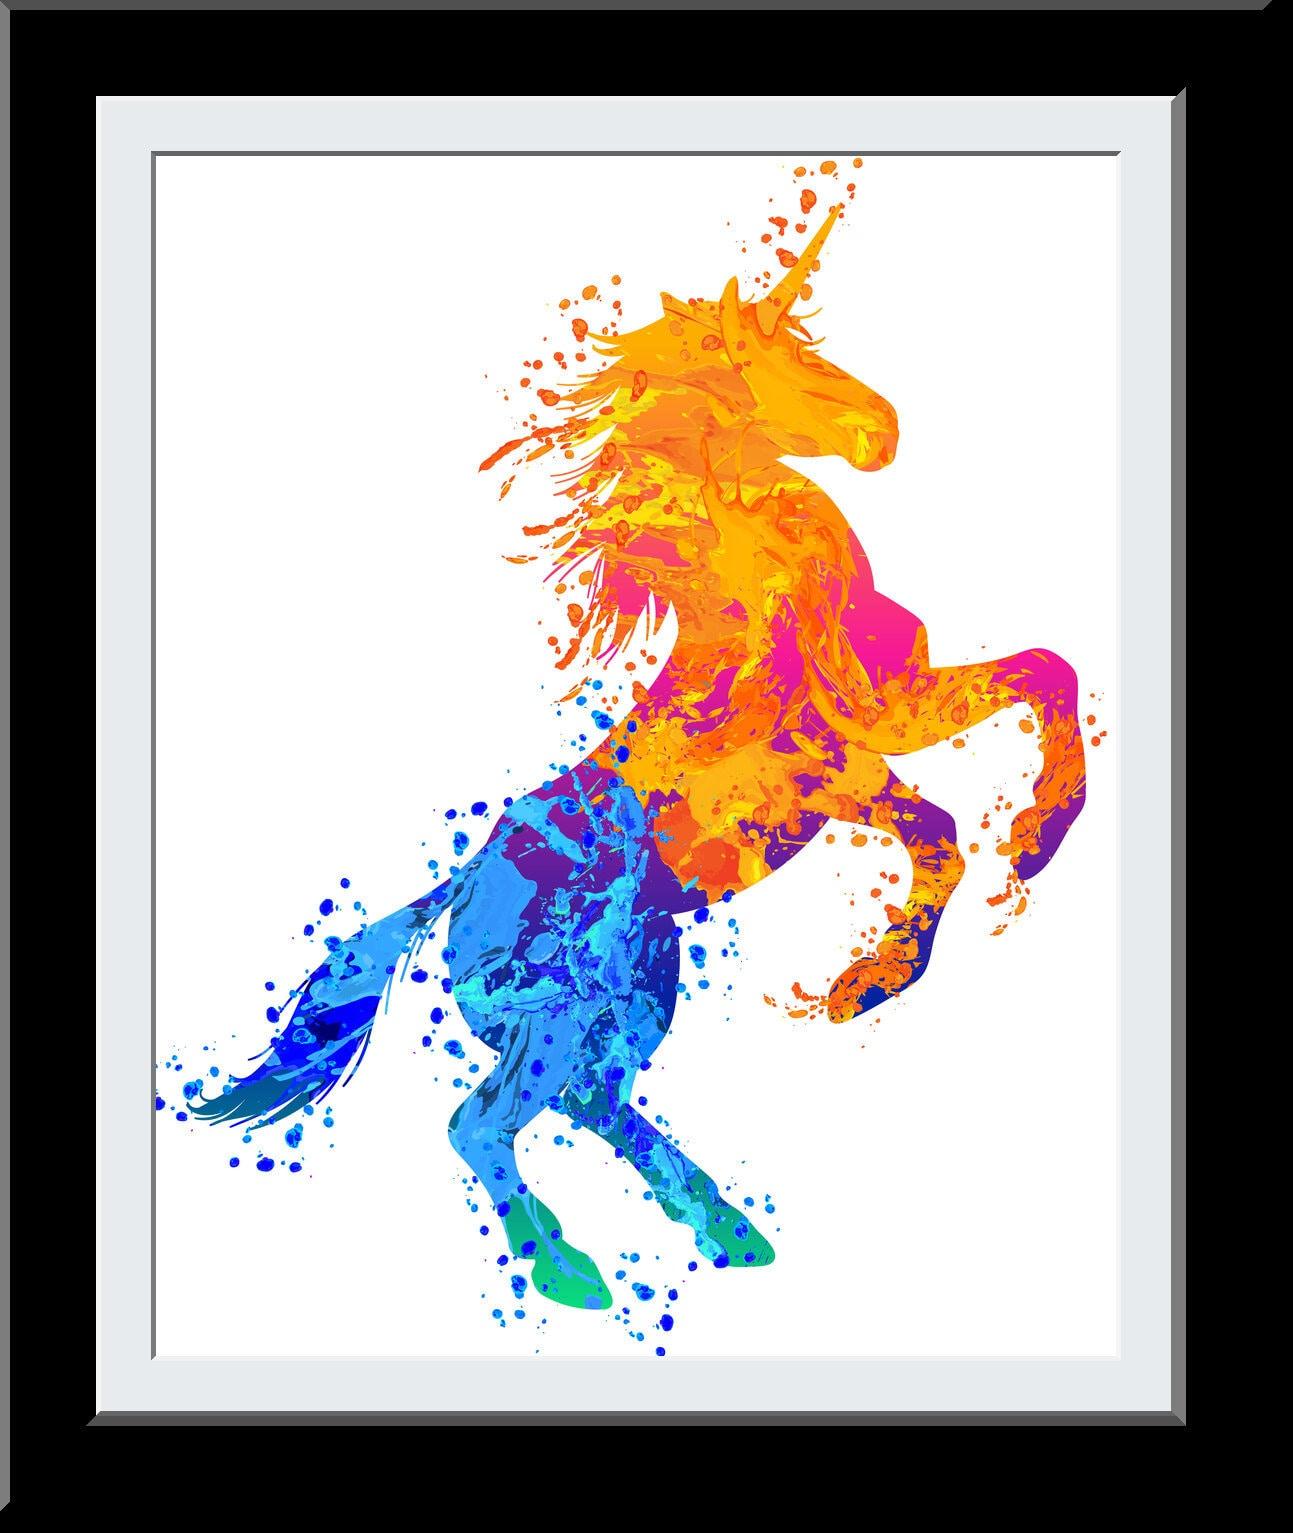 Beautiful Unicorn Gift - Standing Unicorn WaterColor Print - Fire+Water Elemental Digital Painting - Gift for Girls - Nursery Decor Wall Art